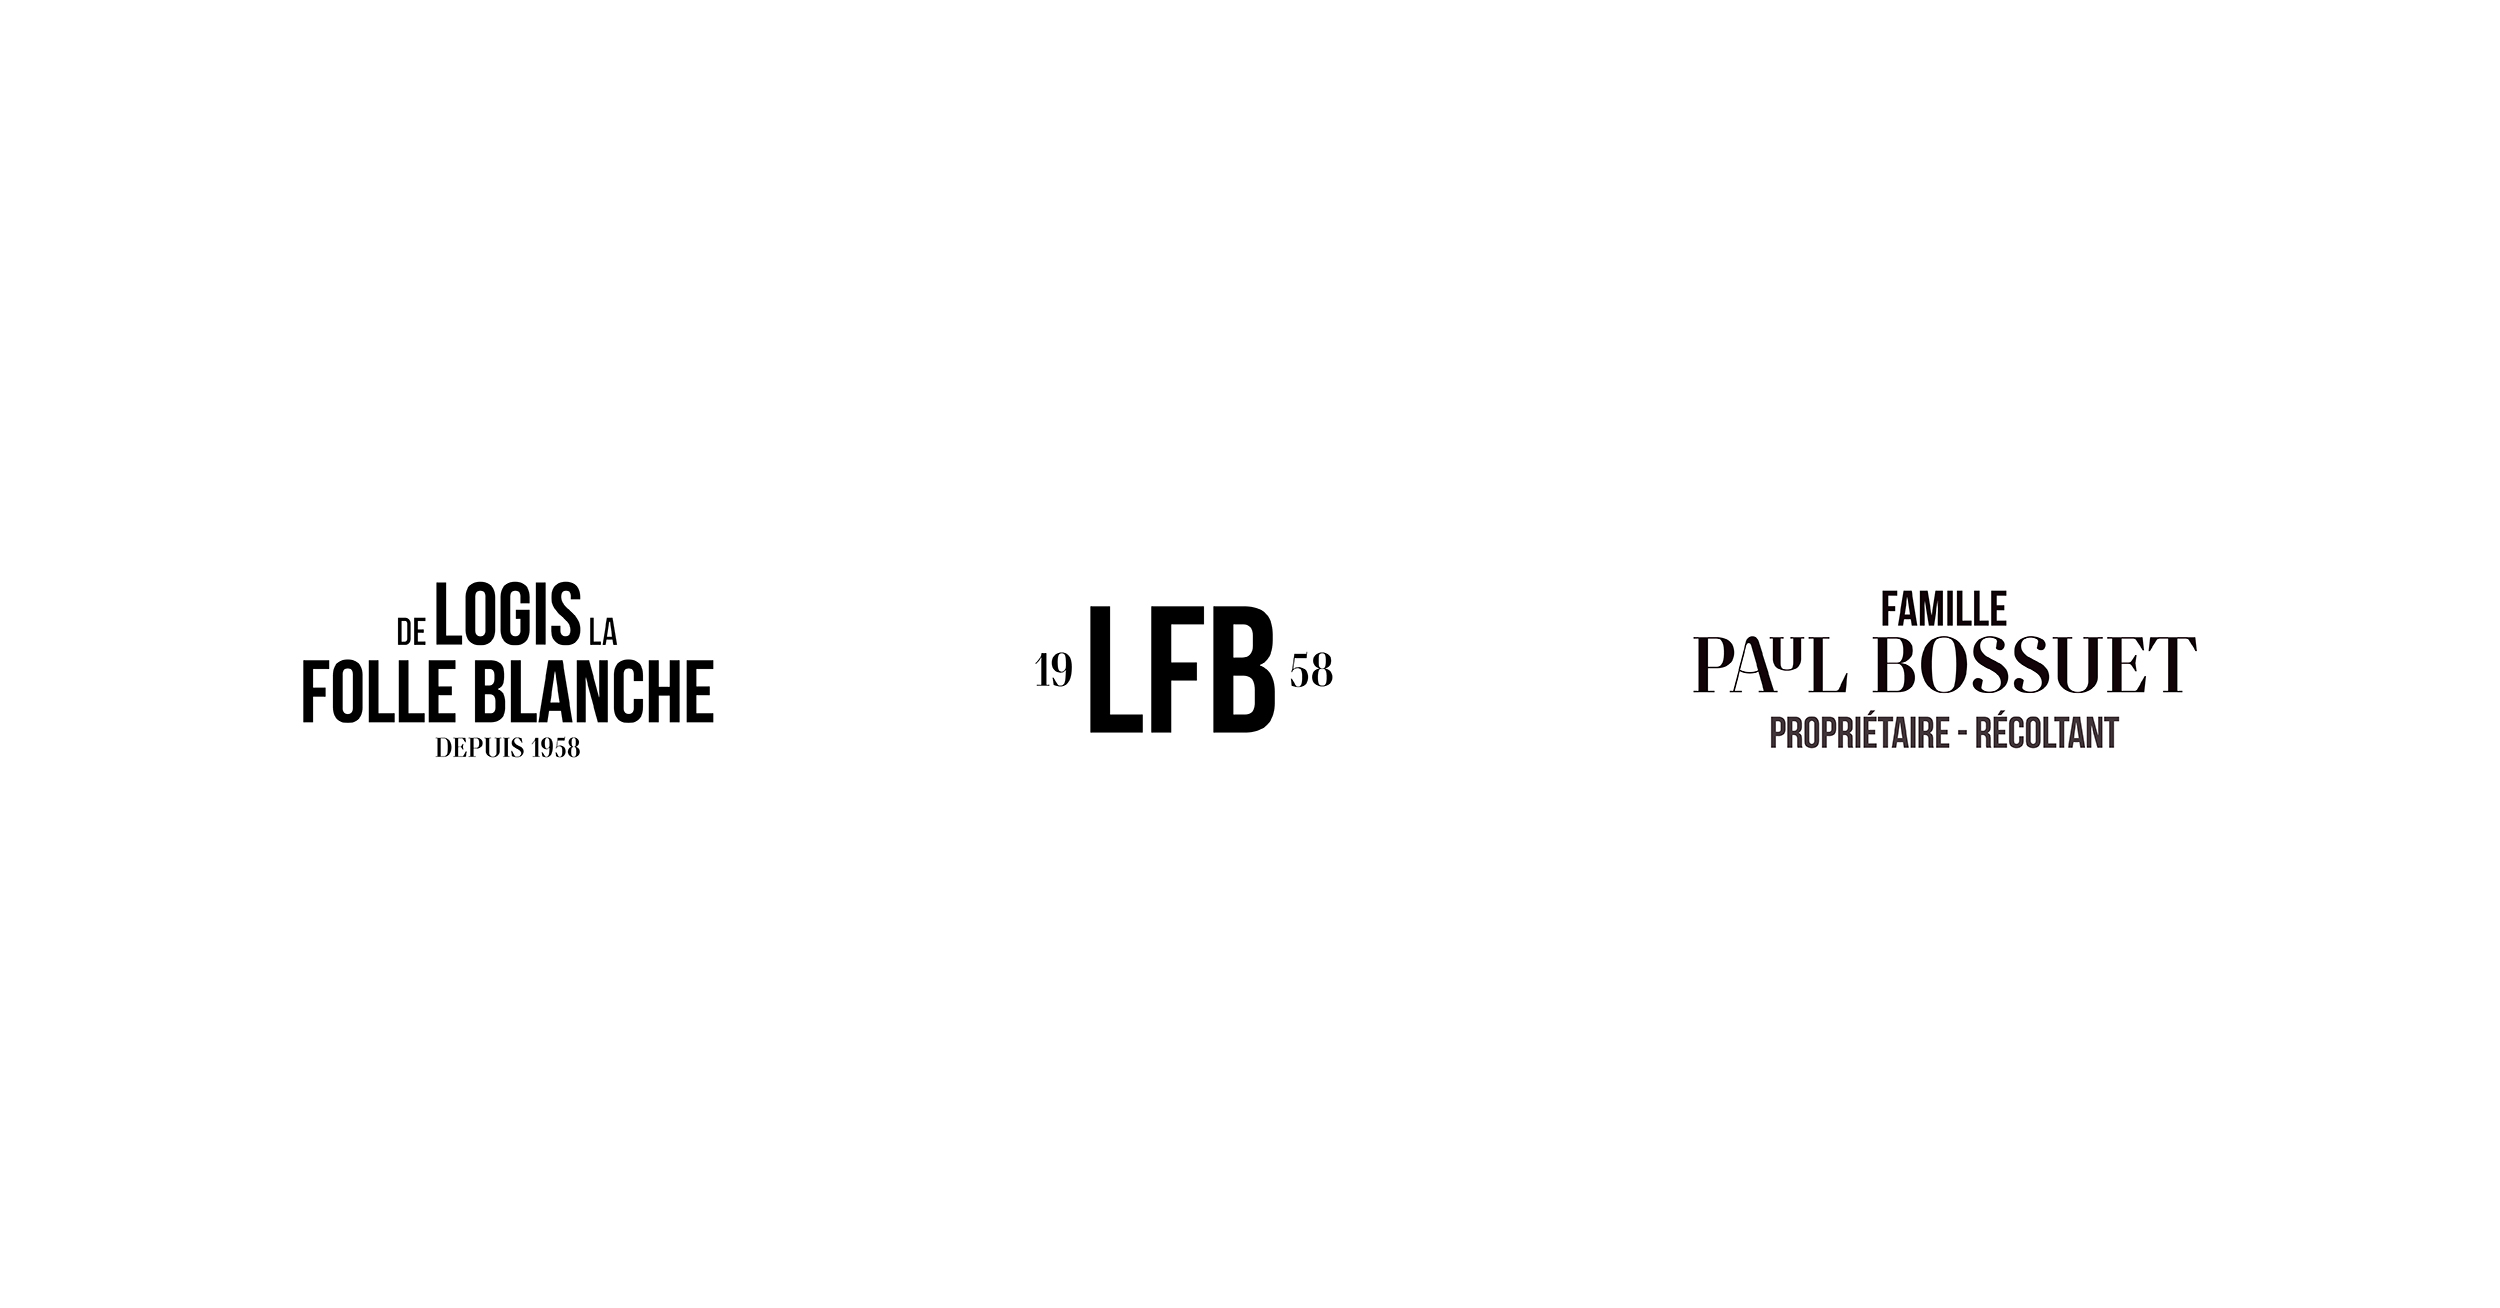 LOGO-WINERY-VIGNOBLE-COGNAC-VIN-PINEAU